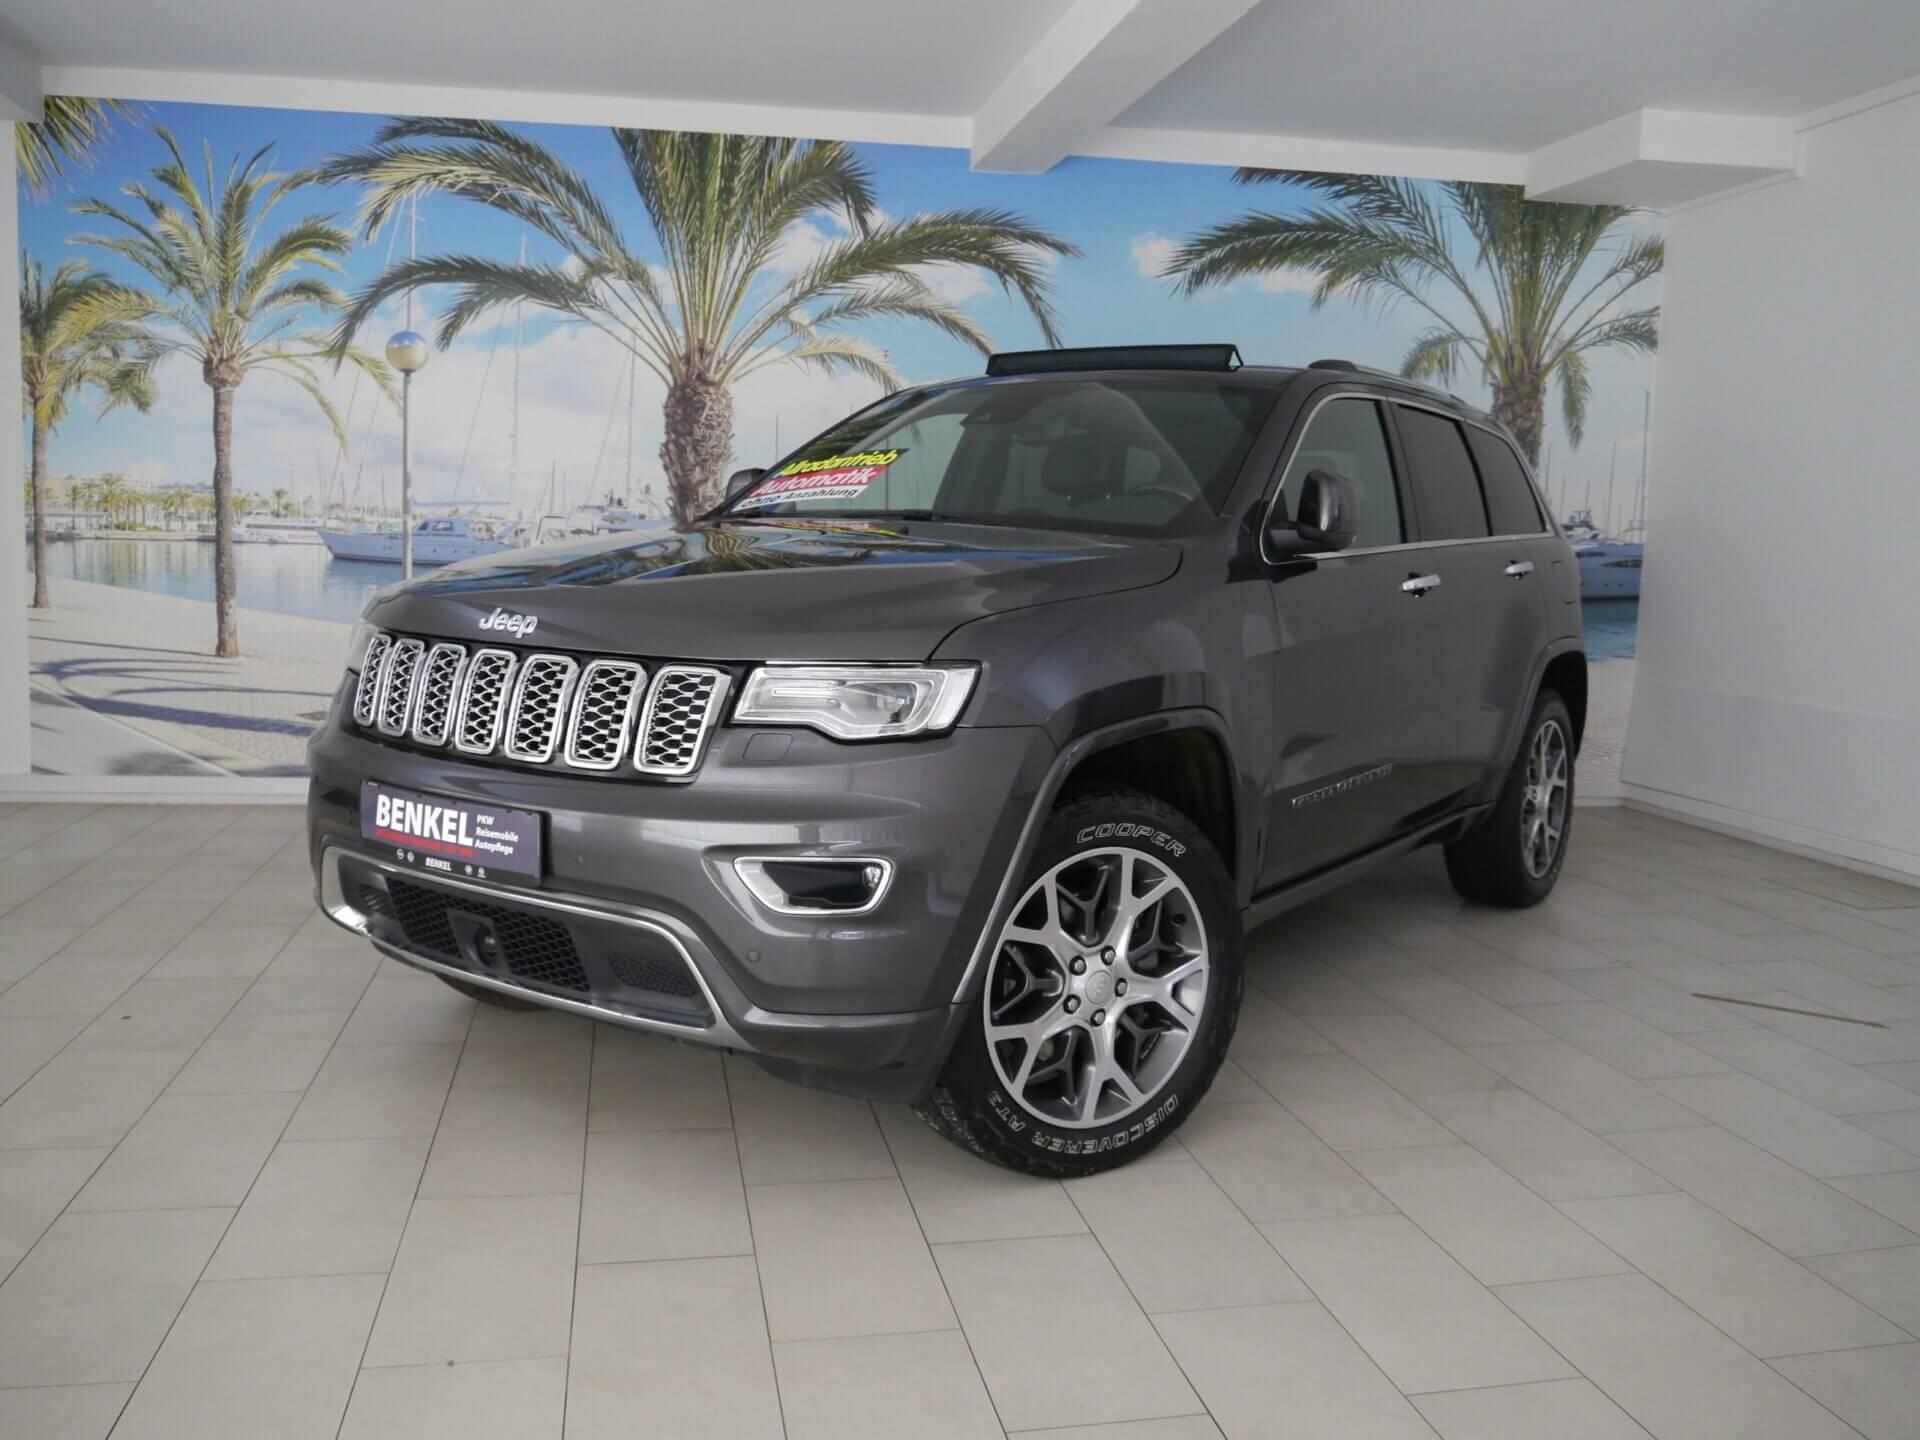 Jeep_Grand_Cherokee_gebraucht